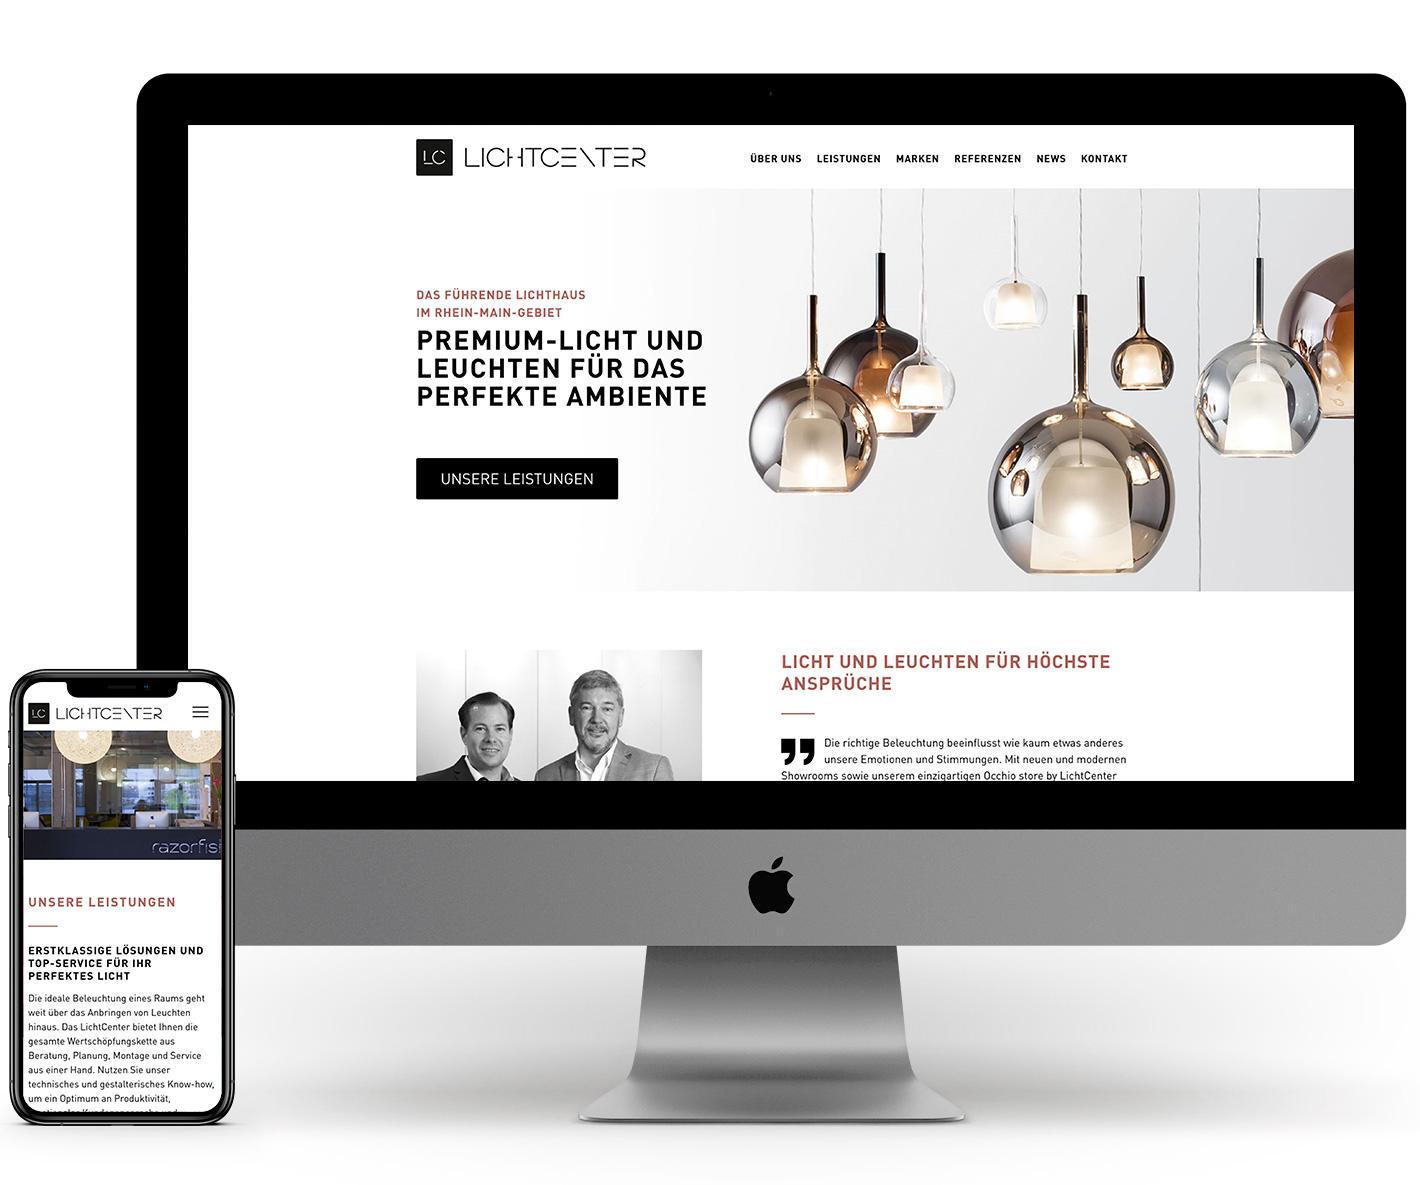 lichtcenter-website-referenzprojekt